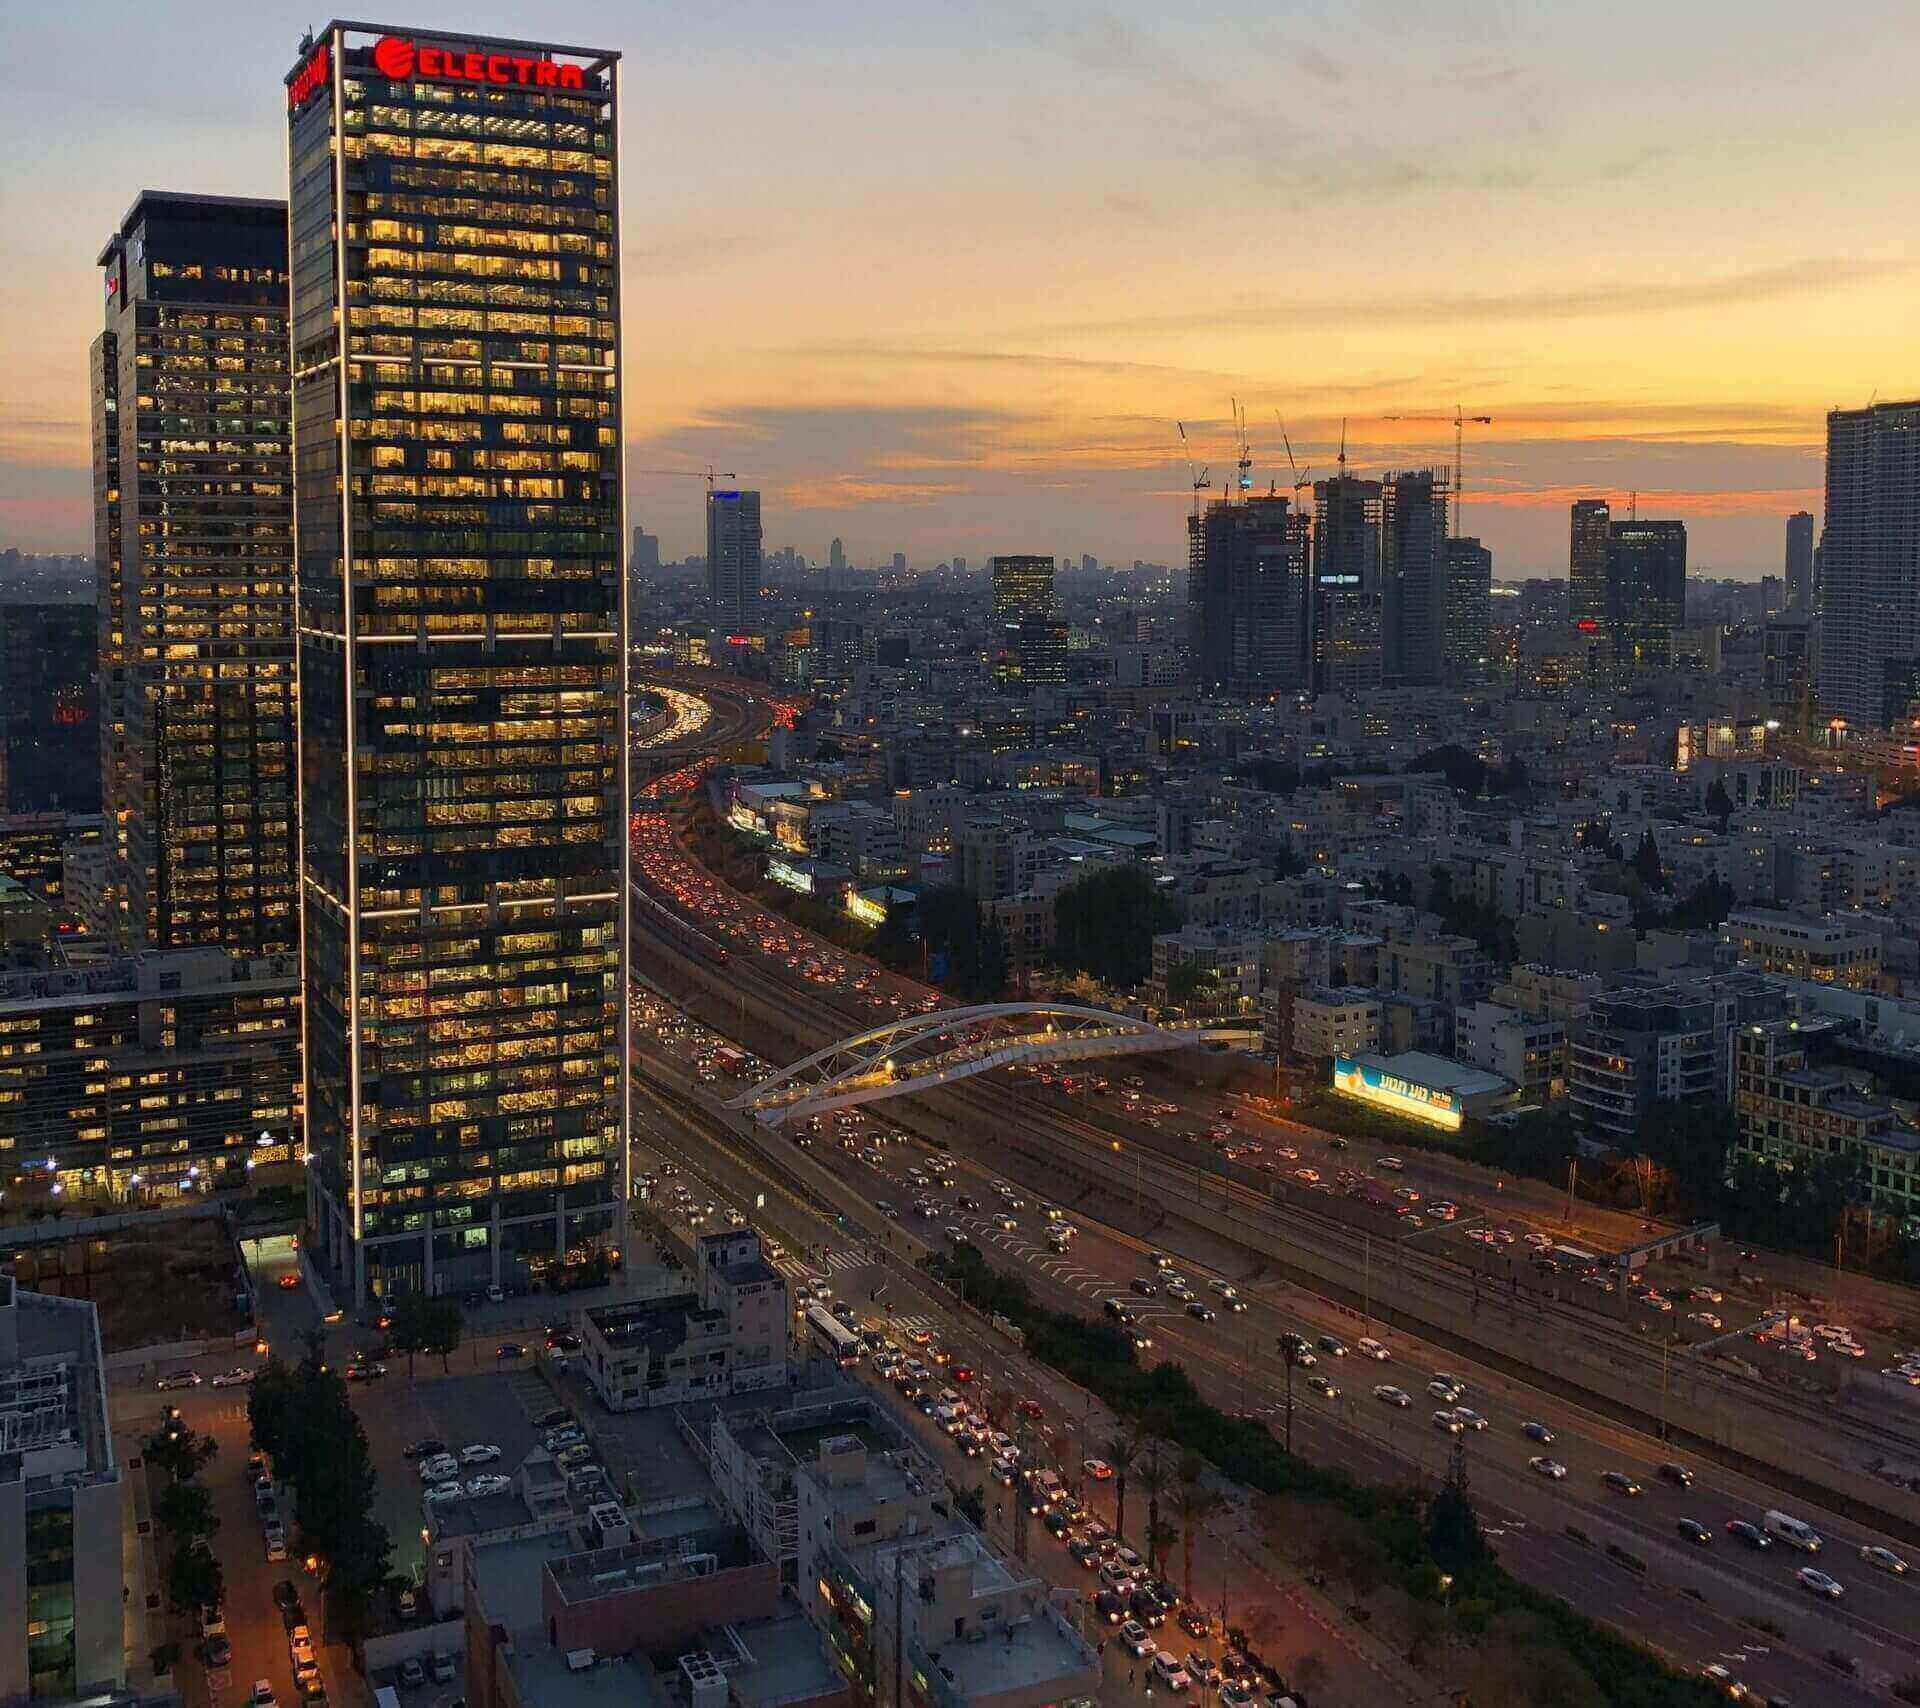 Traffic on Hashalom road in Tel Aviv, Israel. Photo by juliana souza on Unsplash